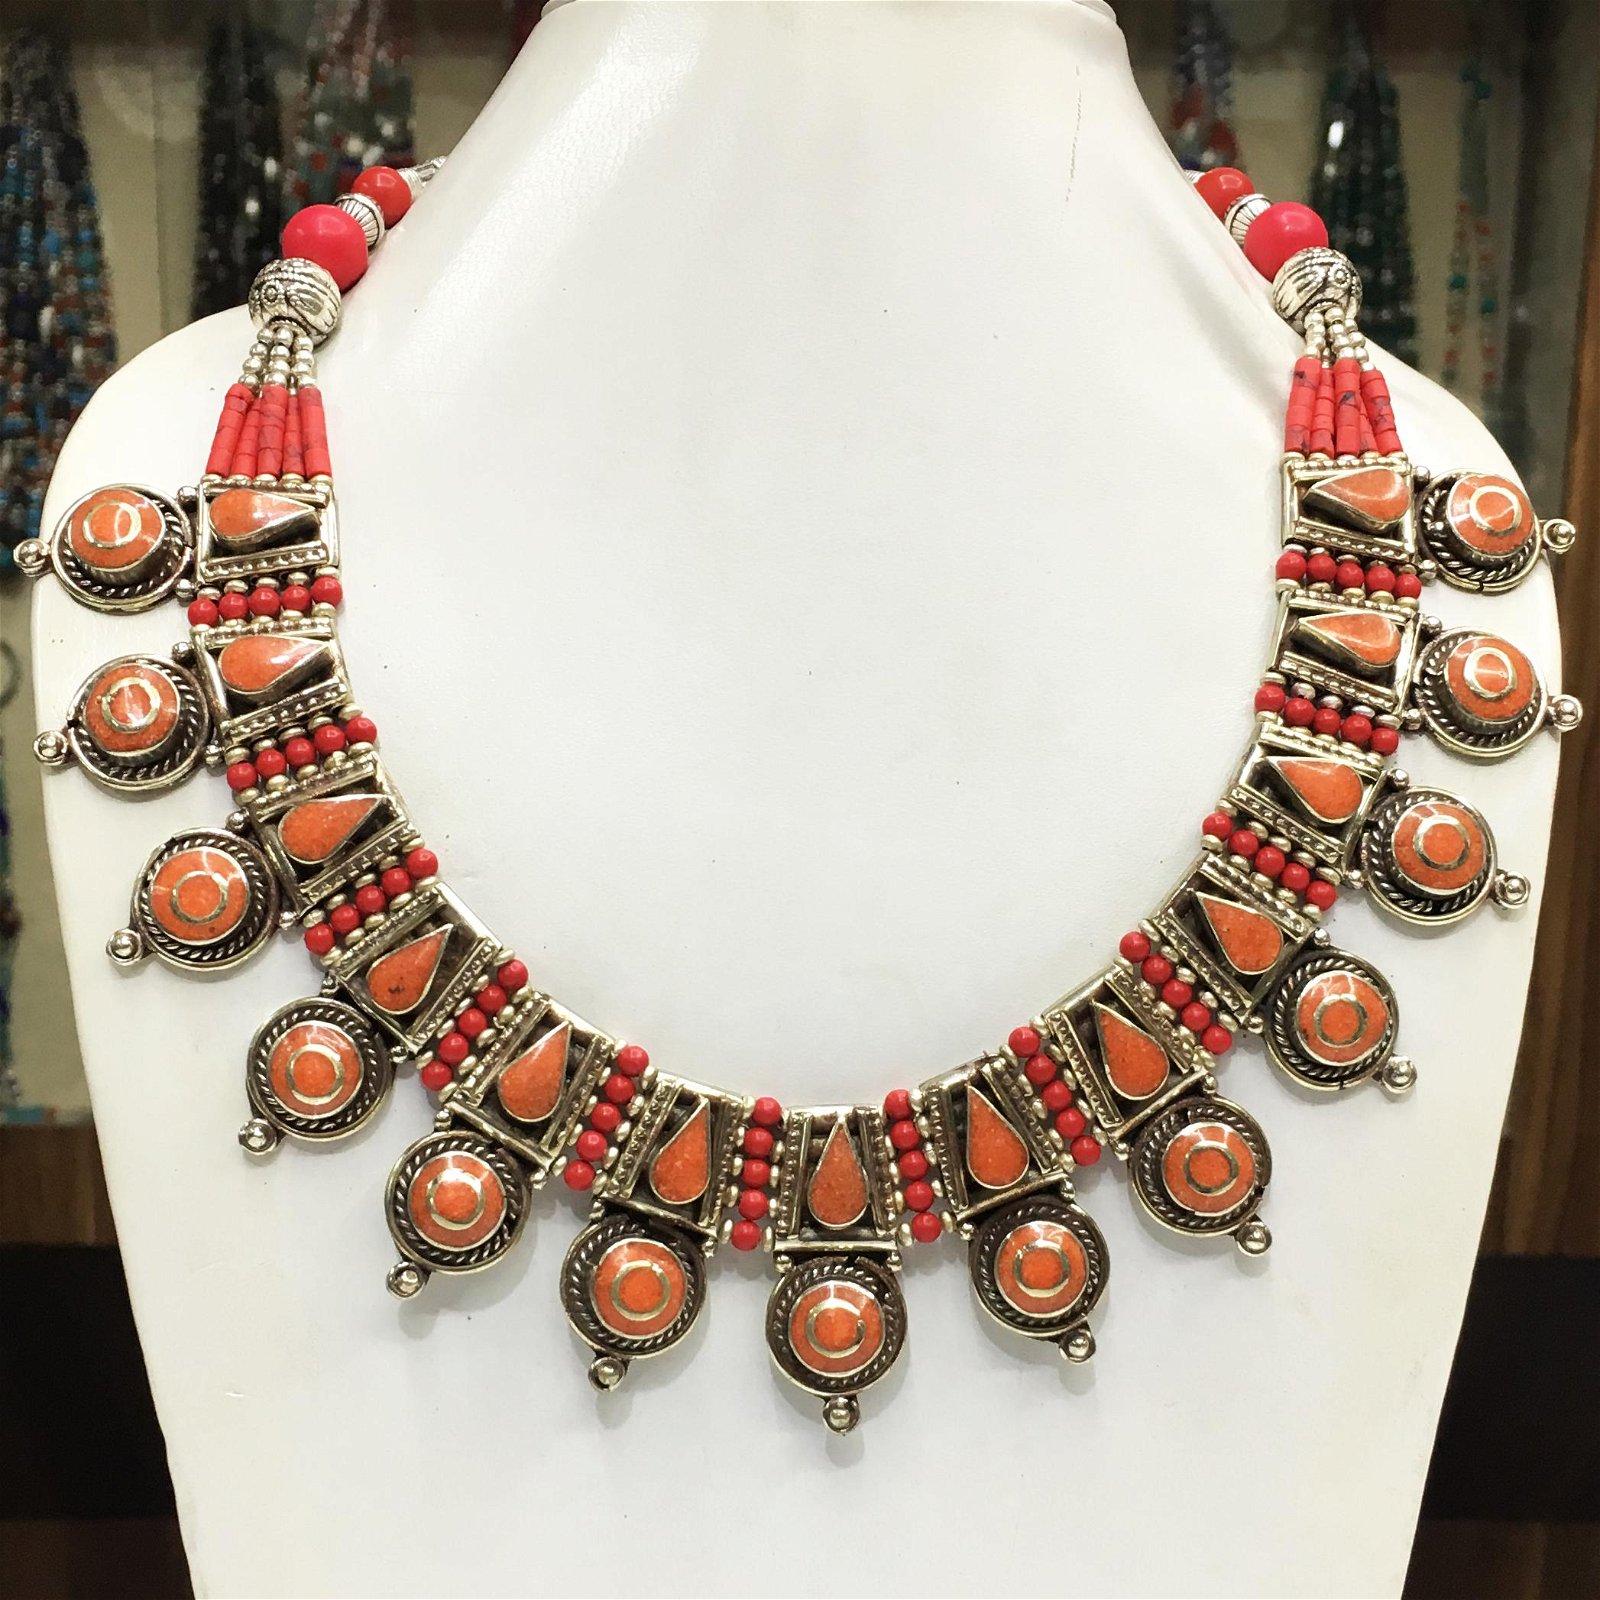 Tibetan Coral Handmade Chokar Necklace